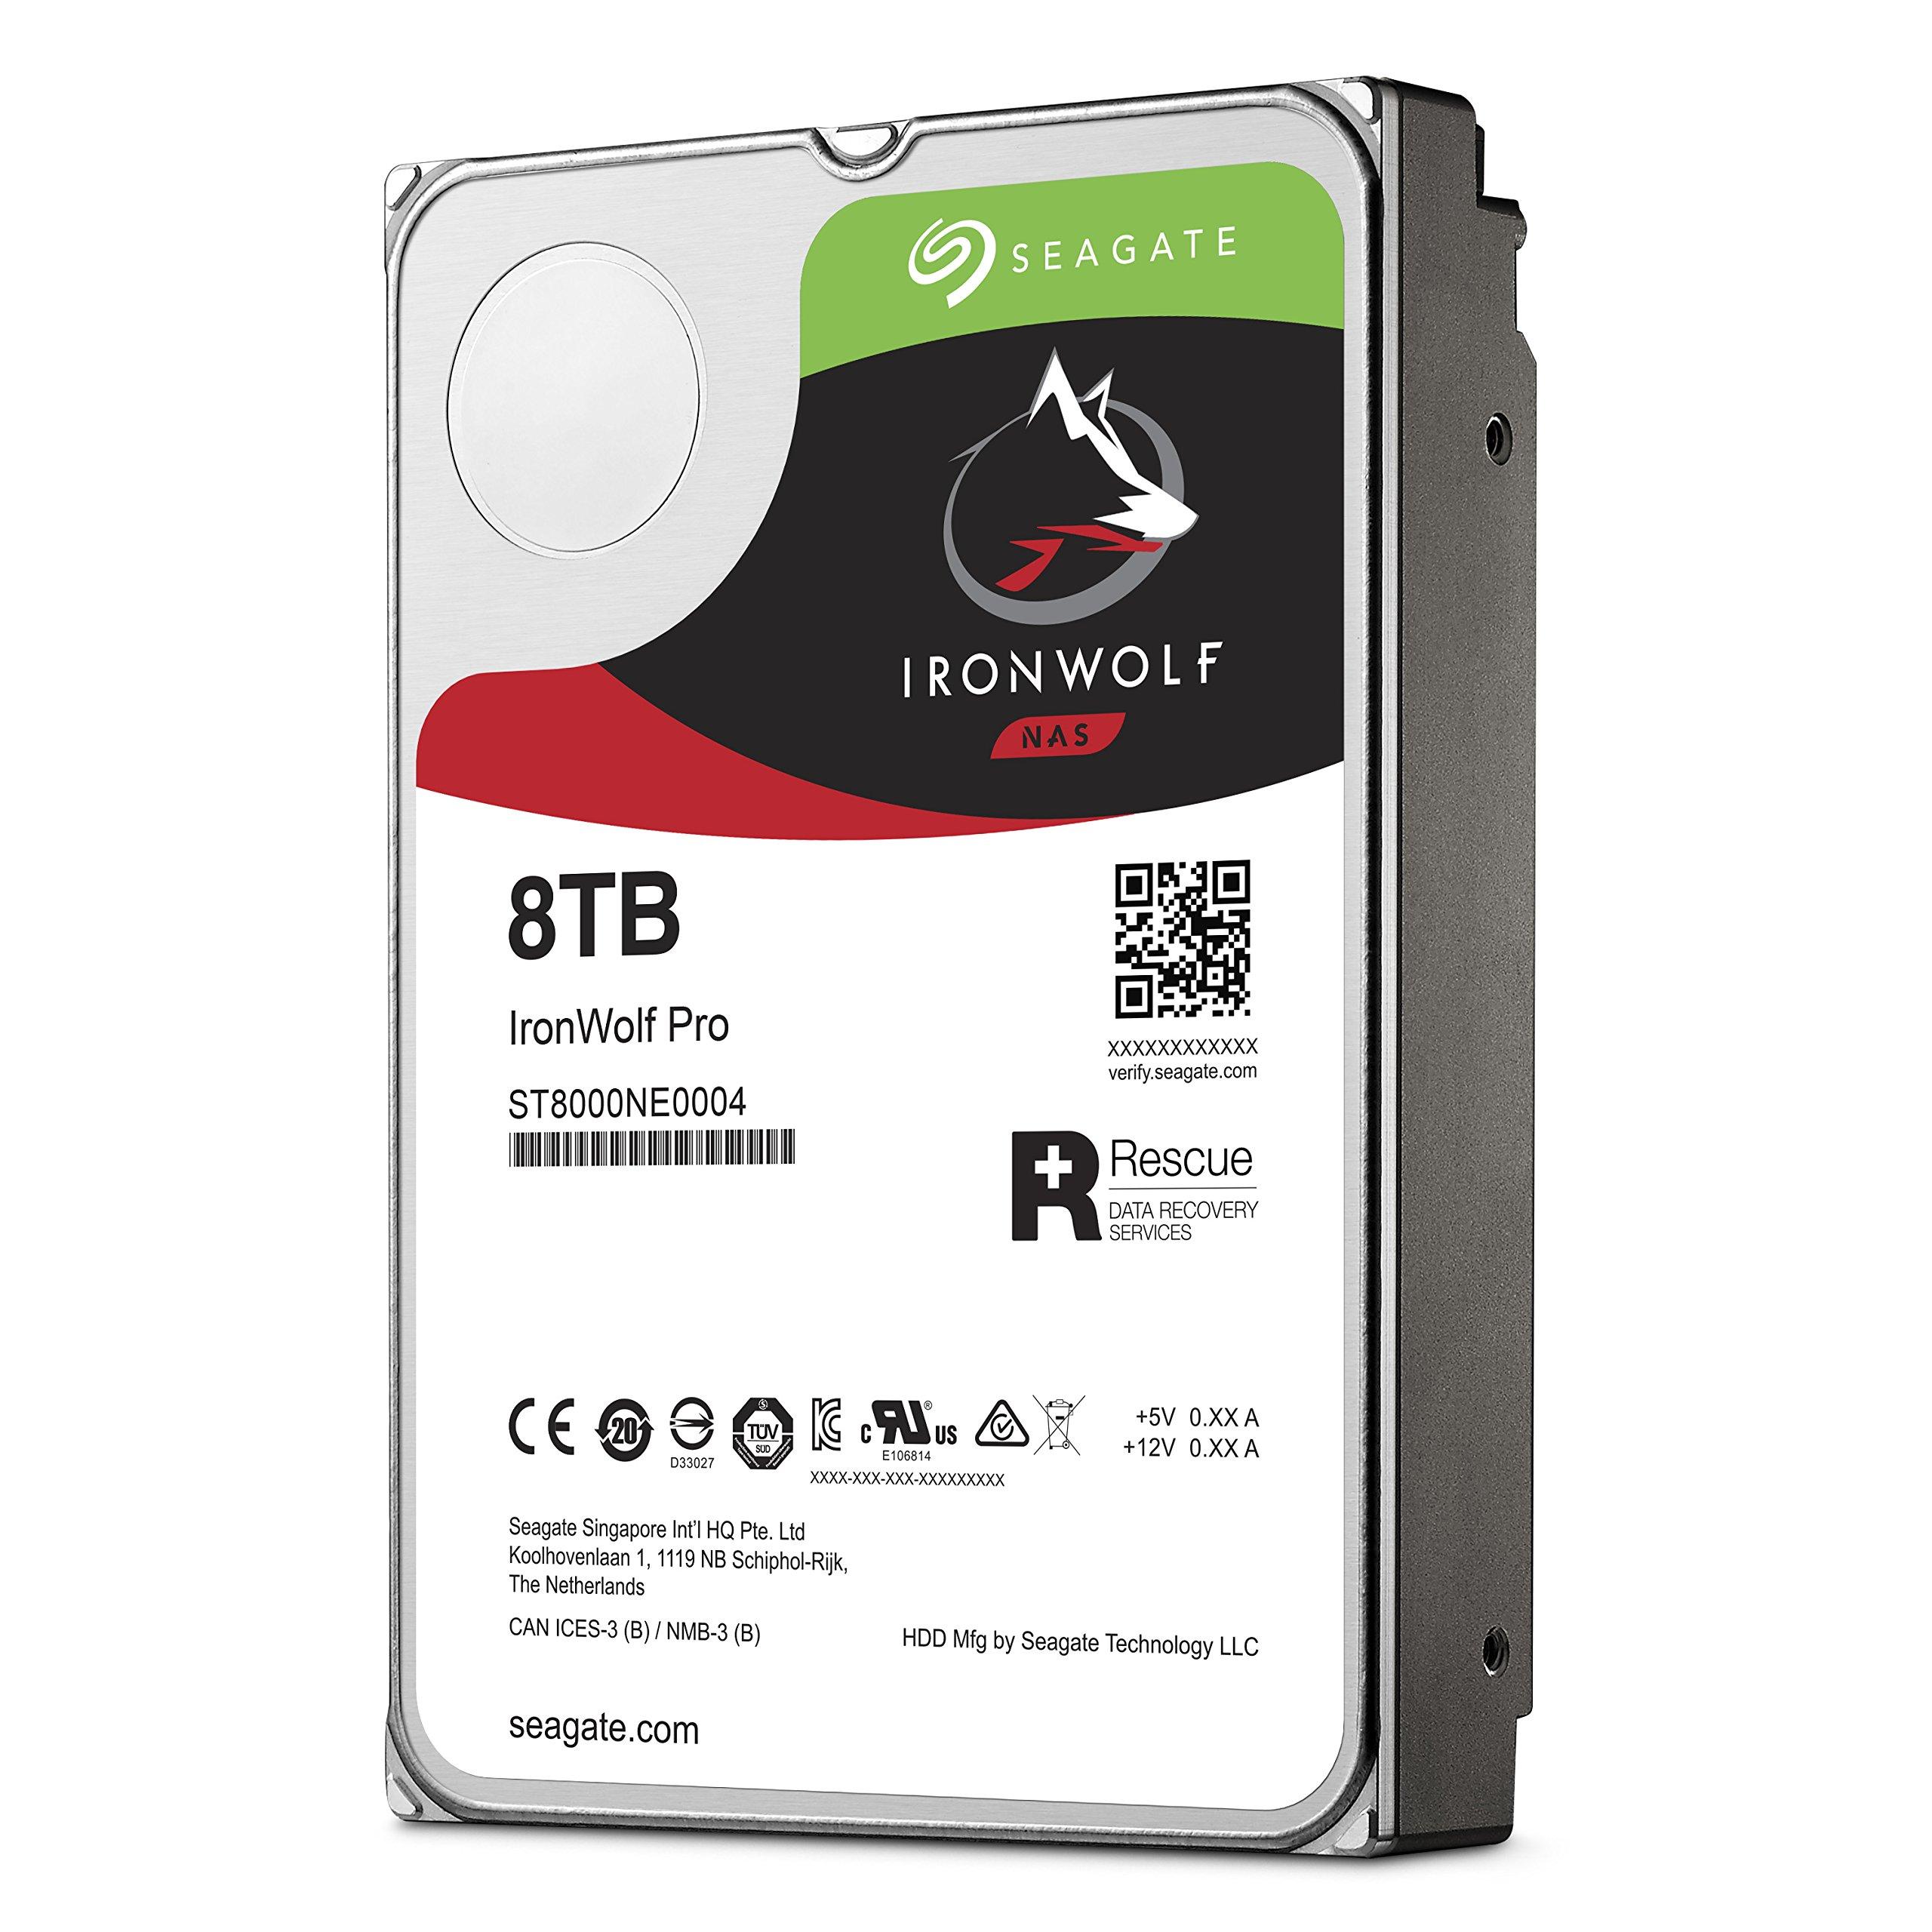 Seagate IronWolf Pro 8 TB NAS RAID Internal Hard Drive - 7,200 RPM SATA 6 Gb/s 3.5-inch (ST8000NE0004) by Seagate (Image #4)